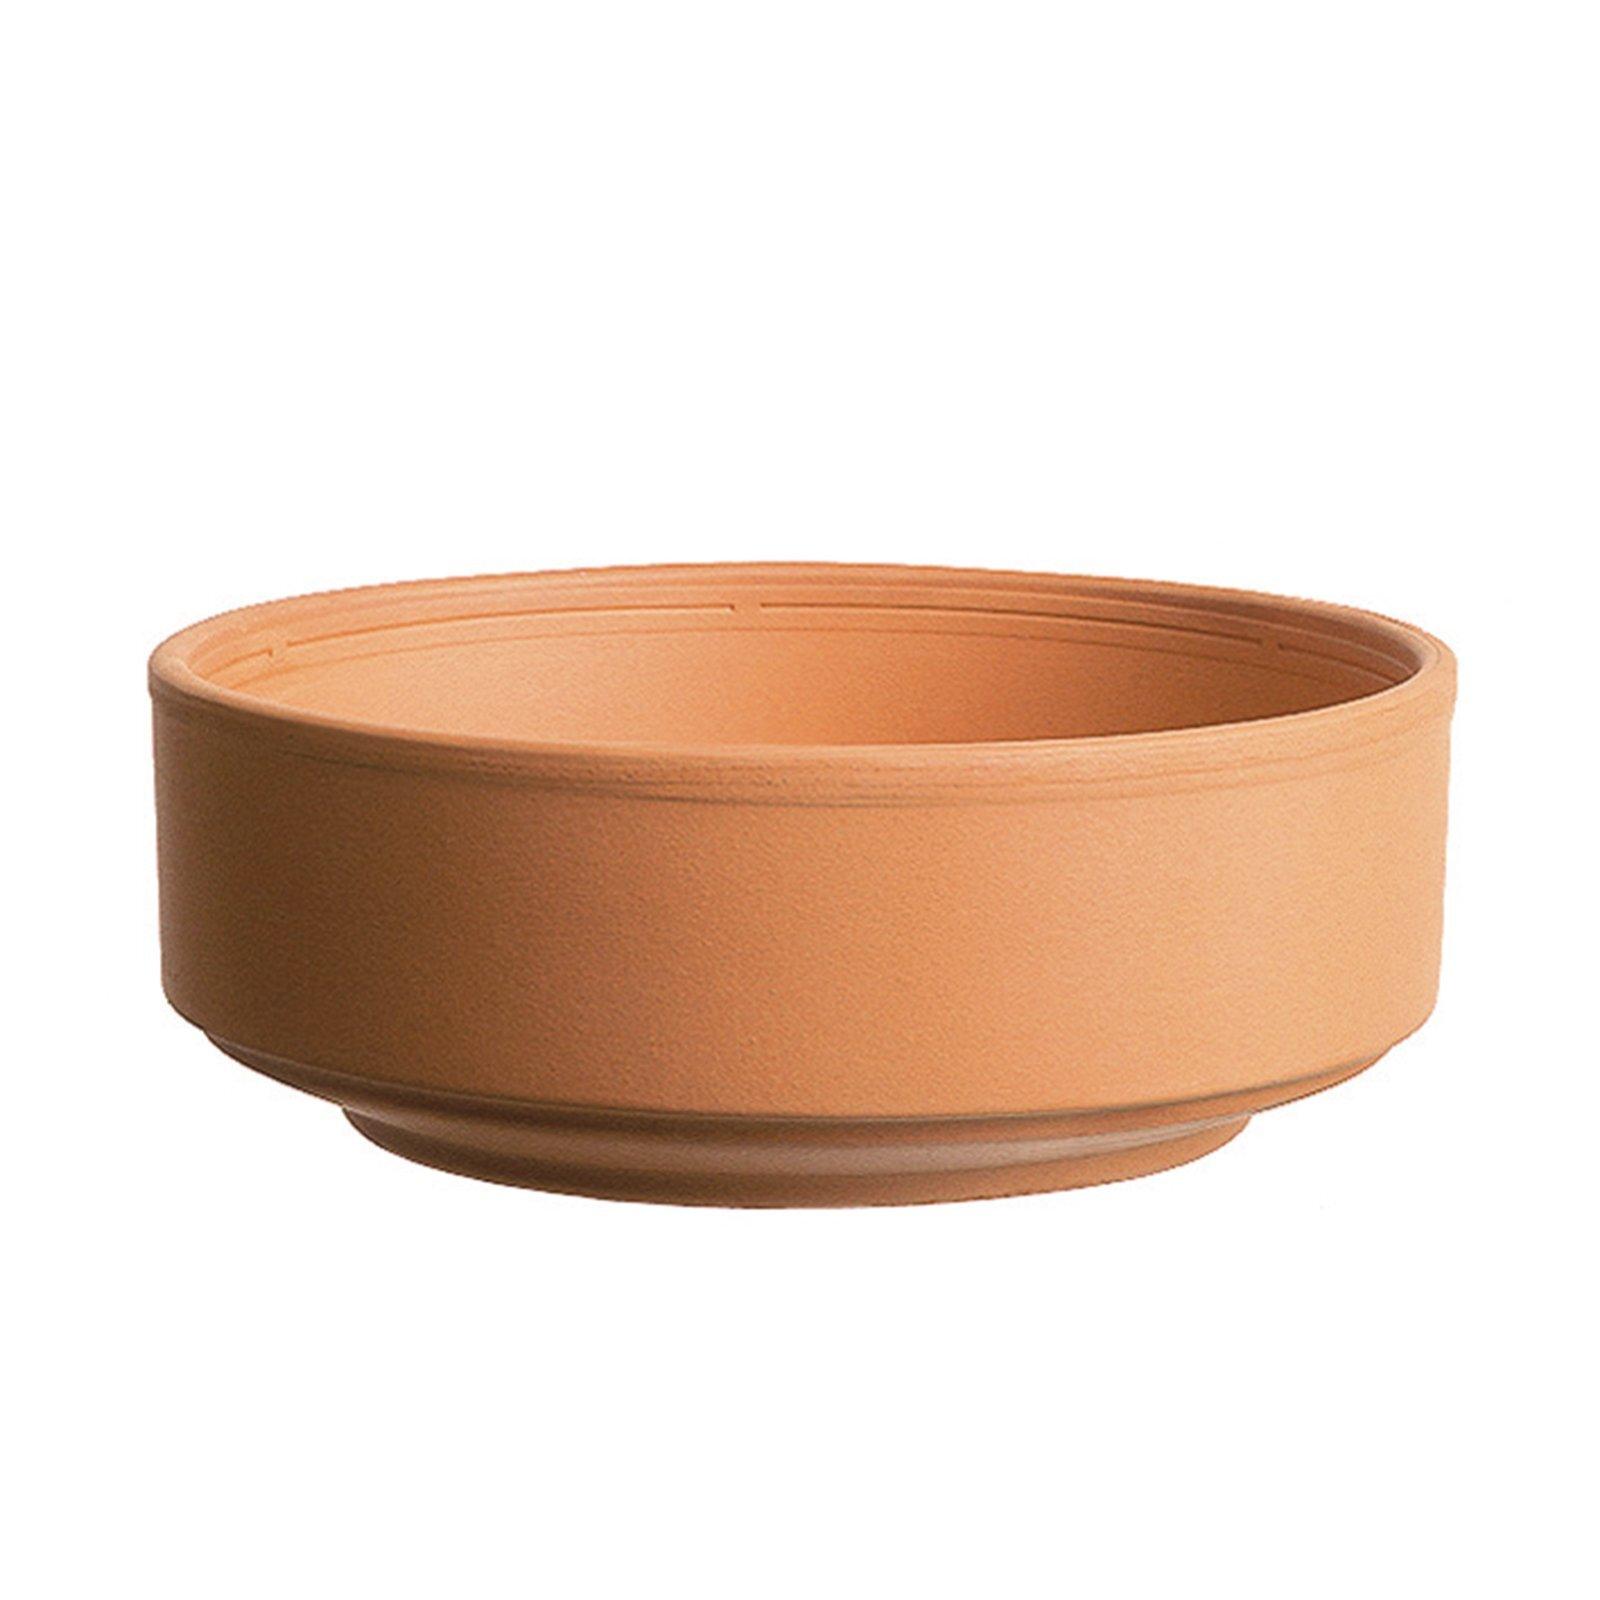 Northcote Pottery 21cm Terracotta Italian Cylinder Bowl